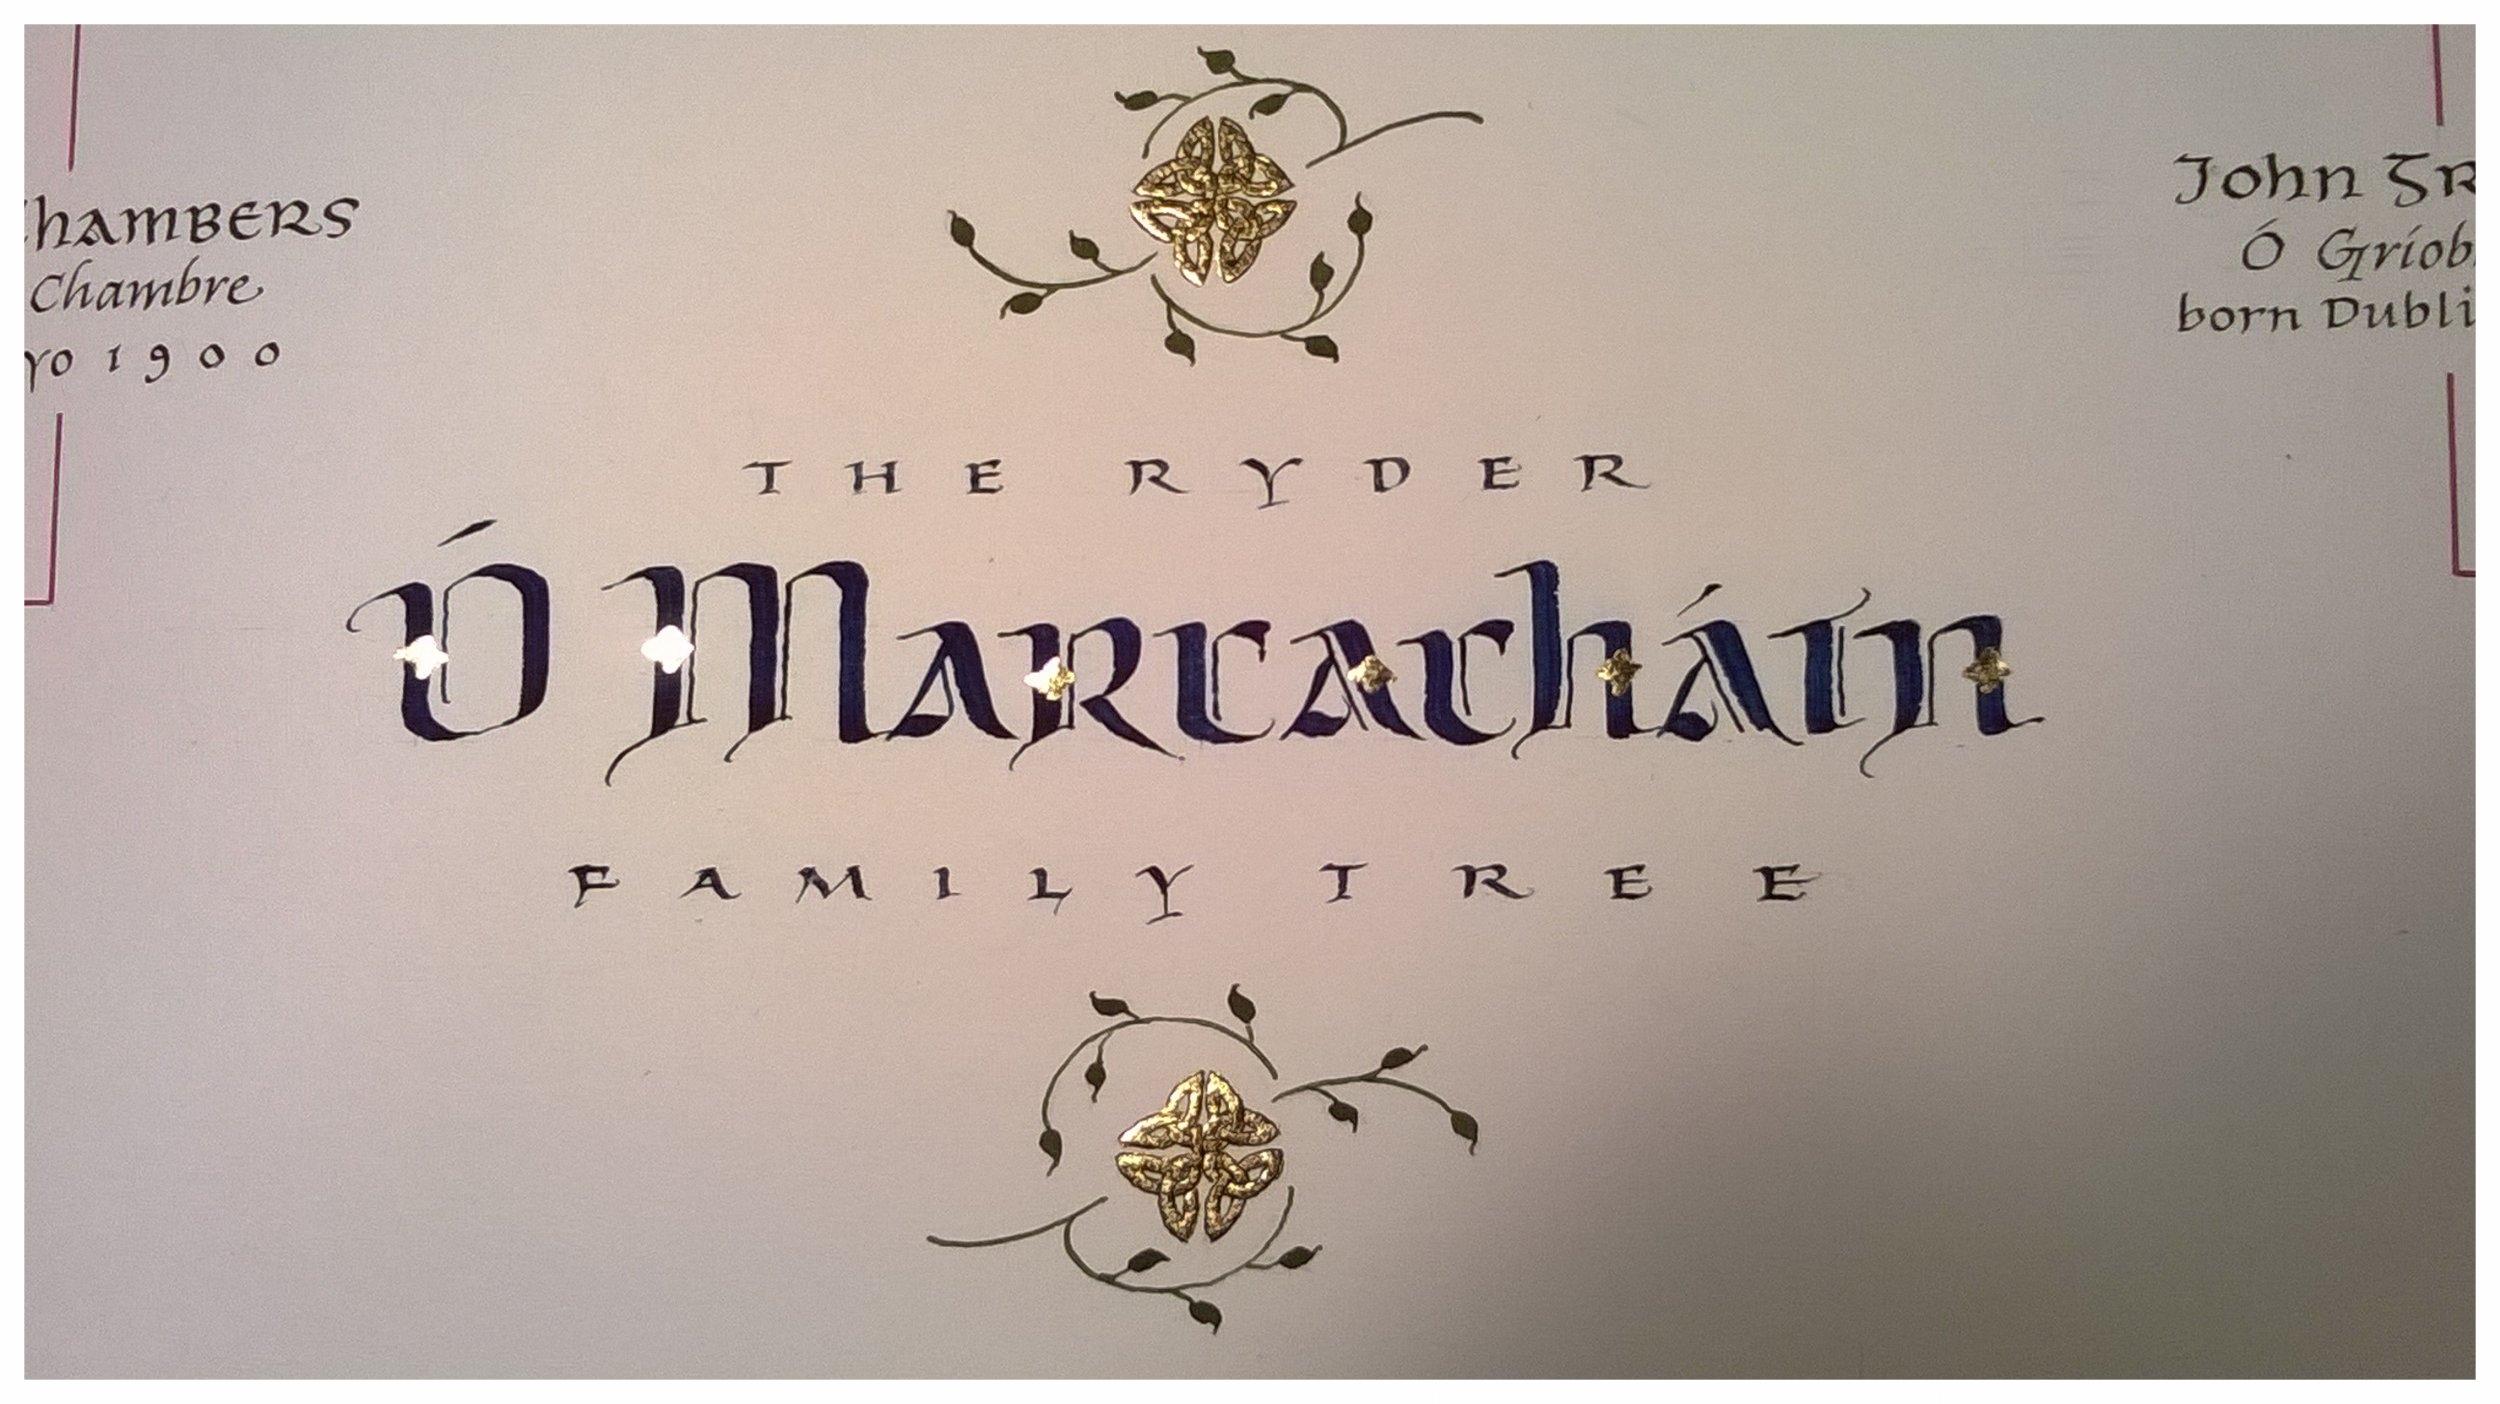 Ryder Family Tree